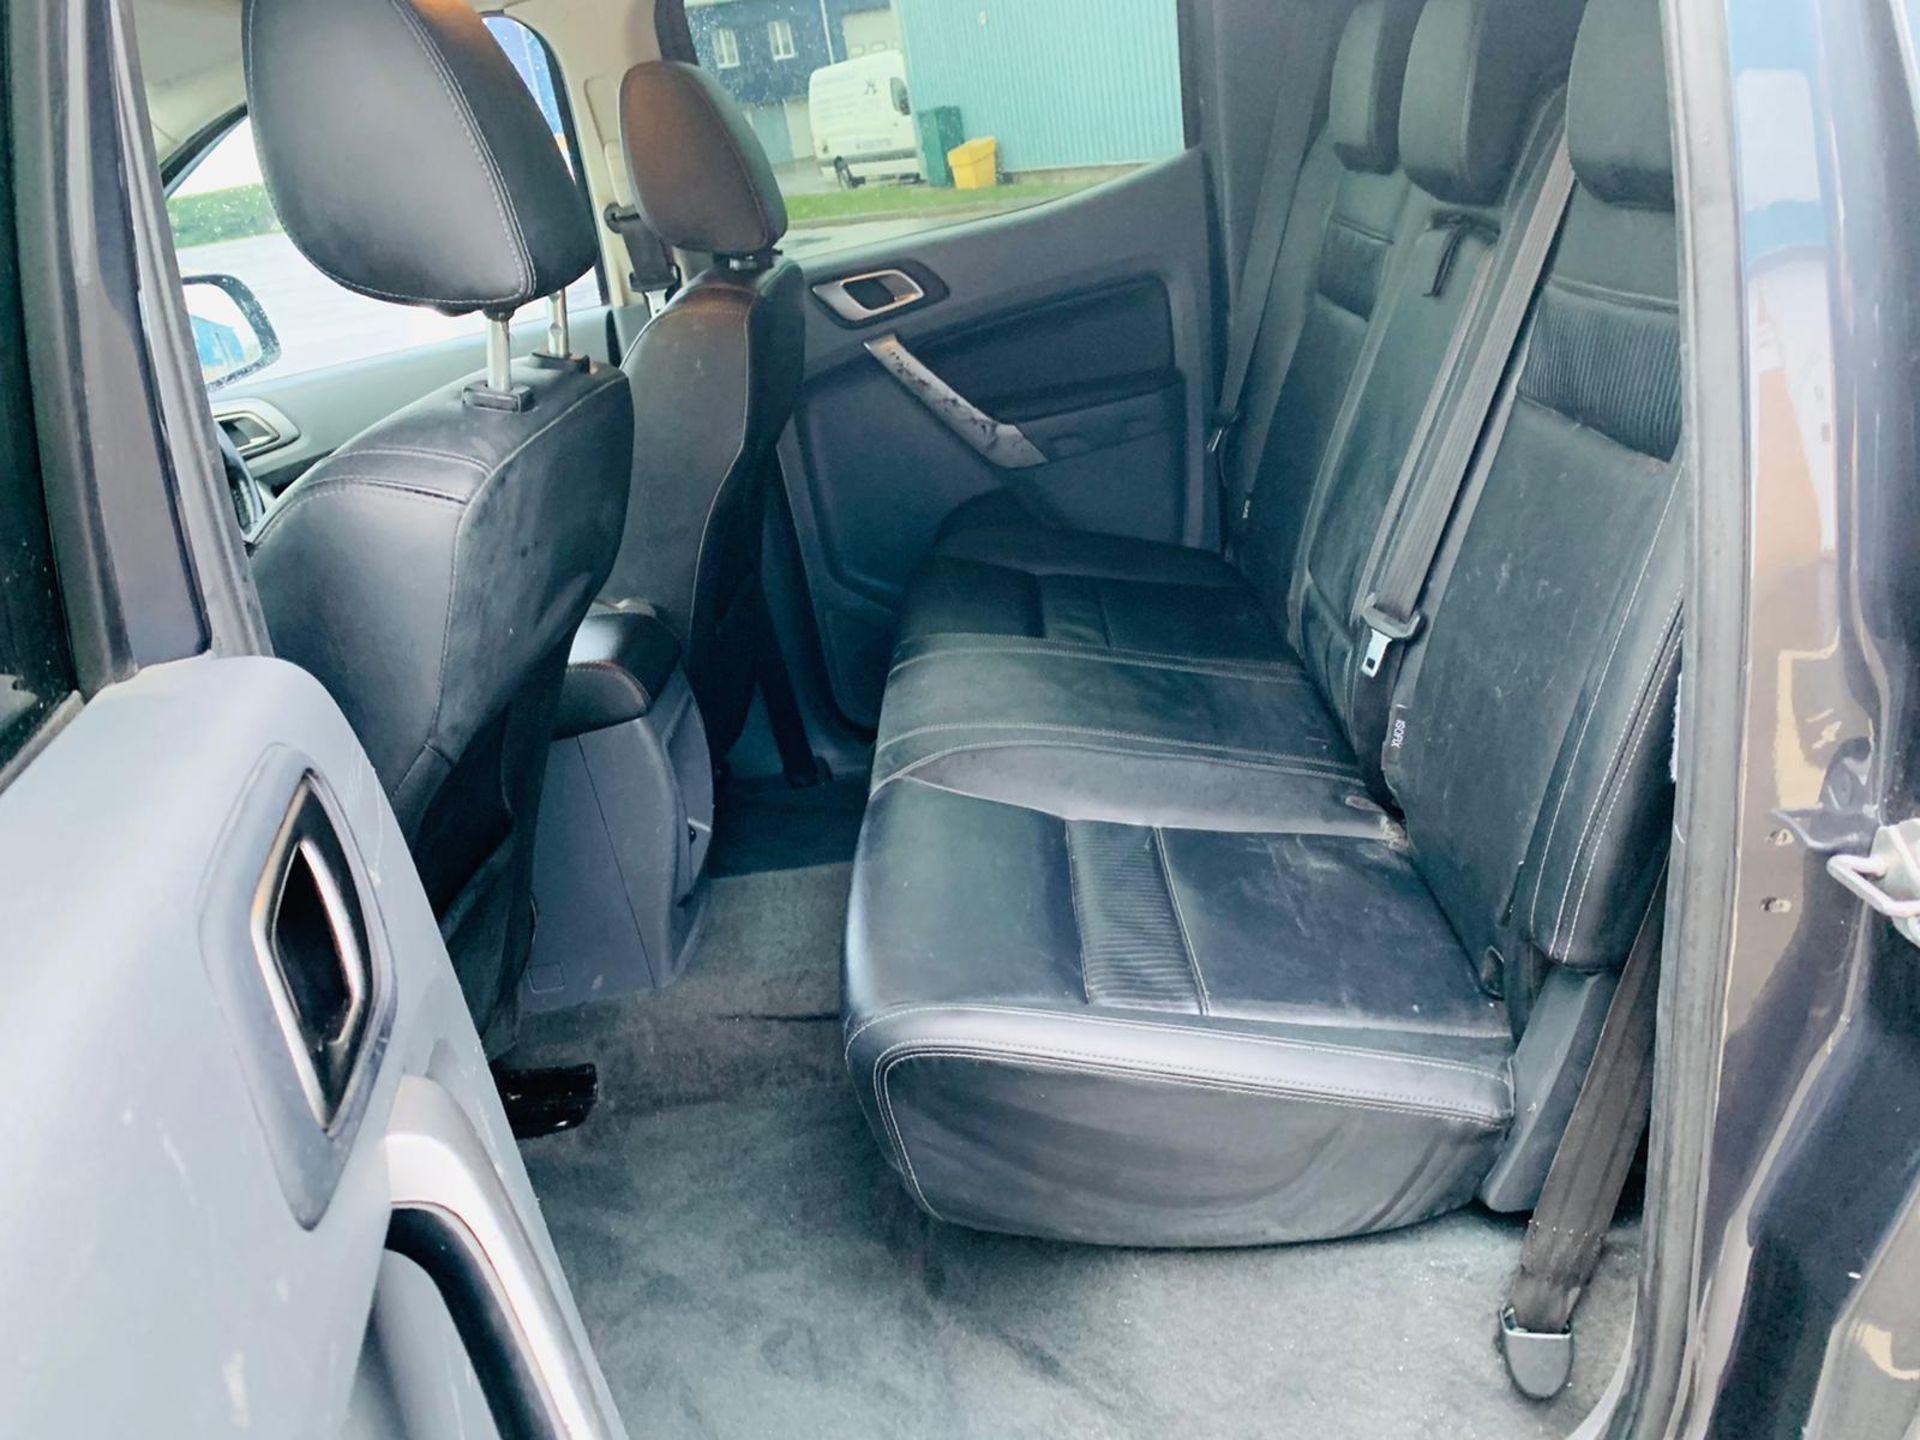 (RESERVE MET) Ford Ranger 2.2 TDCI LTD 4x4 Double Cab 2017 17 Reg - Reversing Cam -Leather - Sat Nav - Image 30 of 32